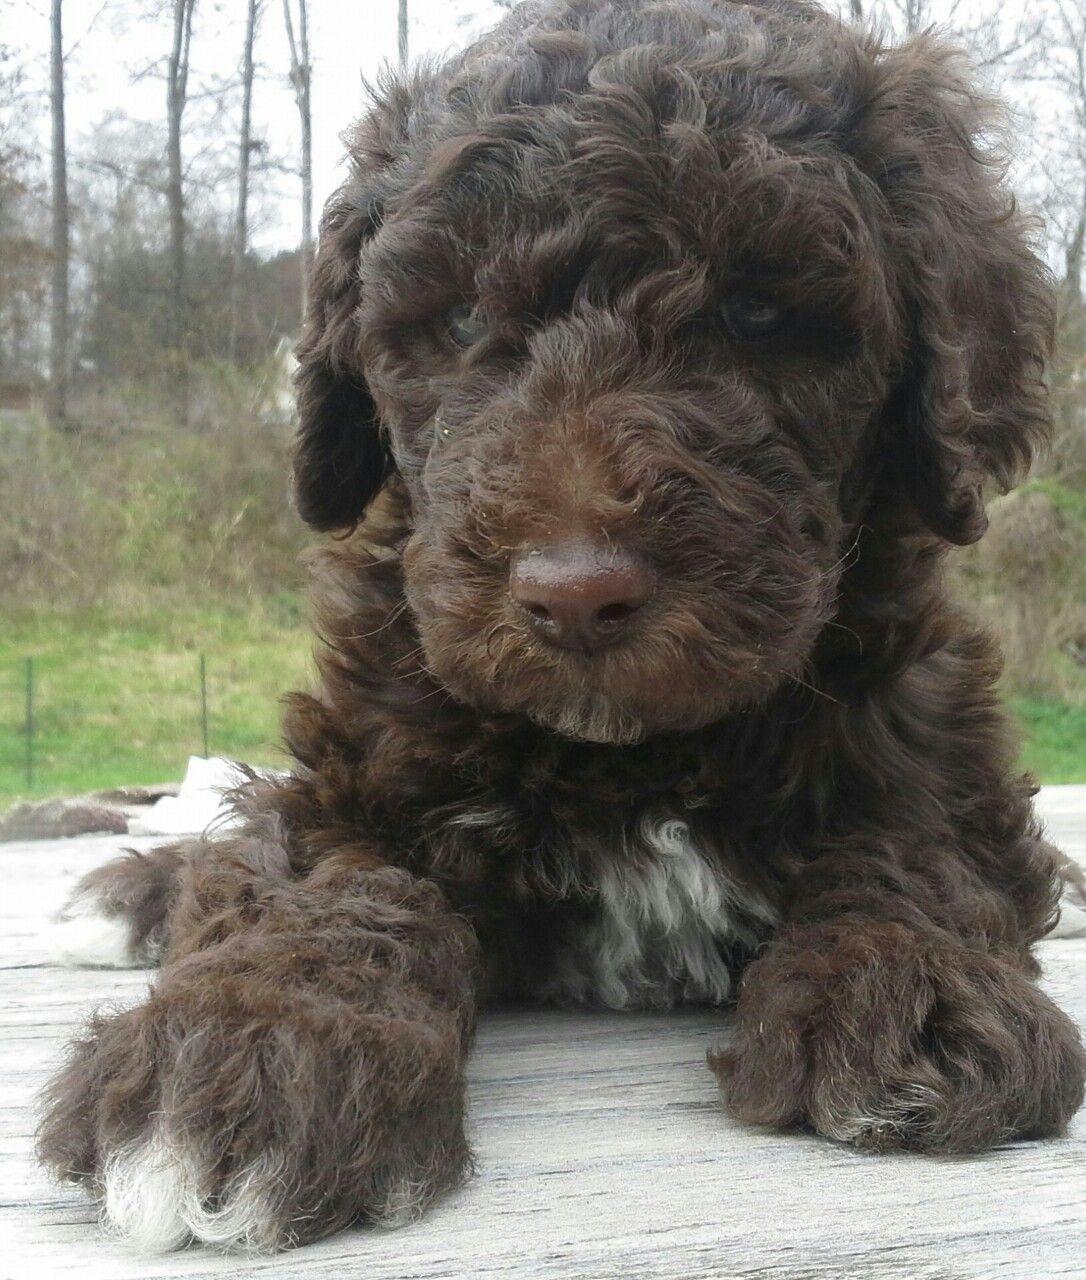 Charlie, the chocolate mismark Standard Poodle at 6 weeks